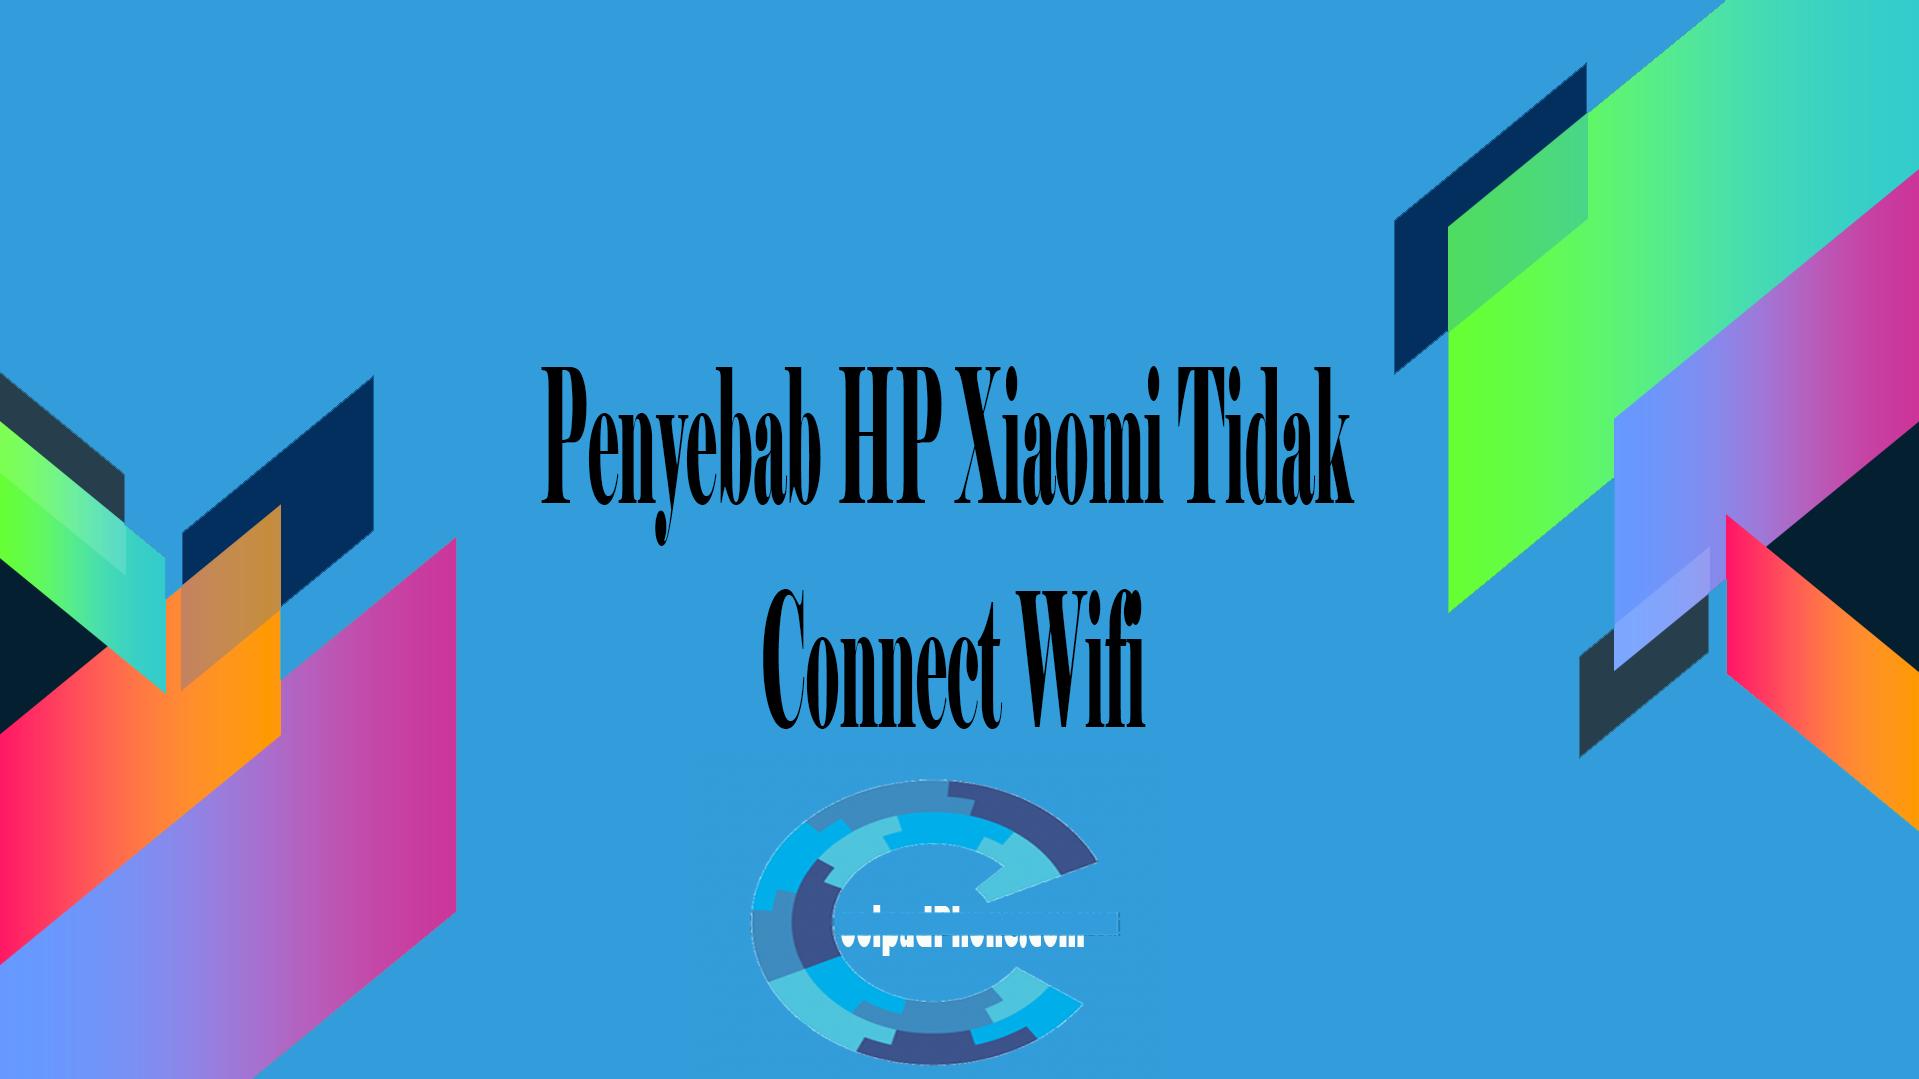 Penyebab HP Xiaomi Tidak Connect Wifi